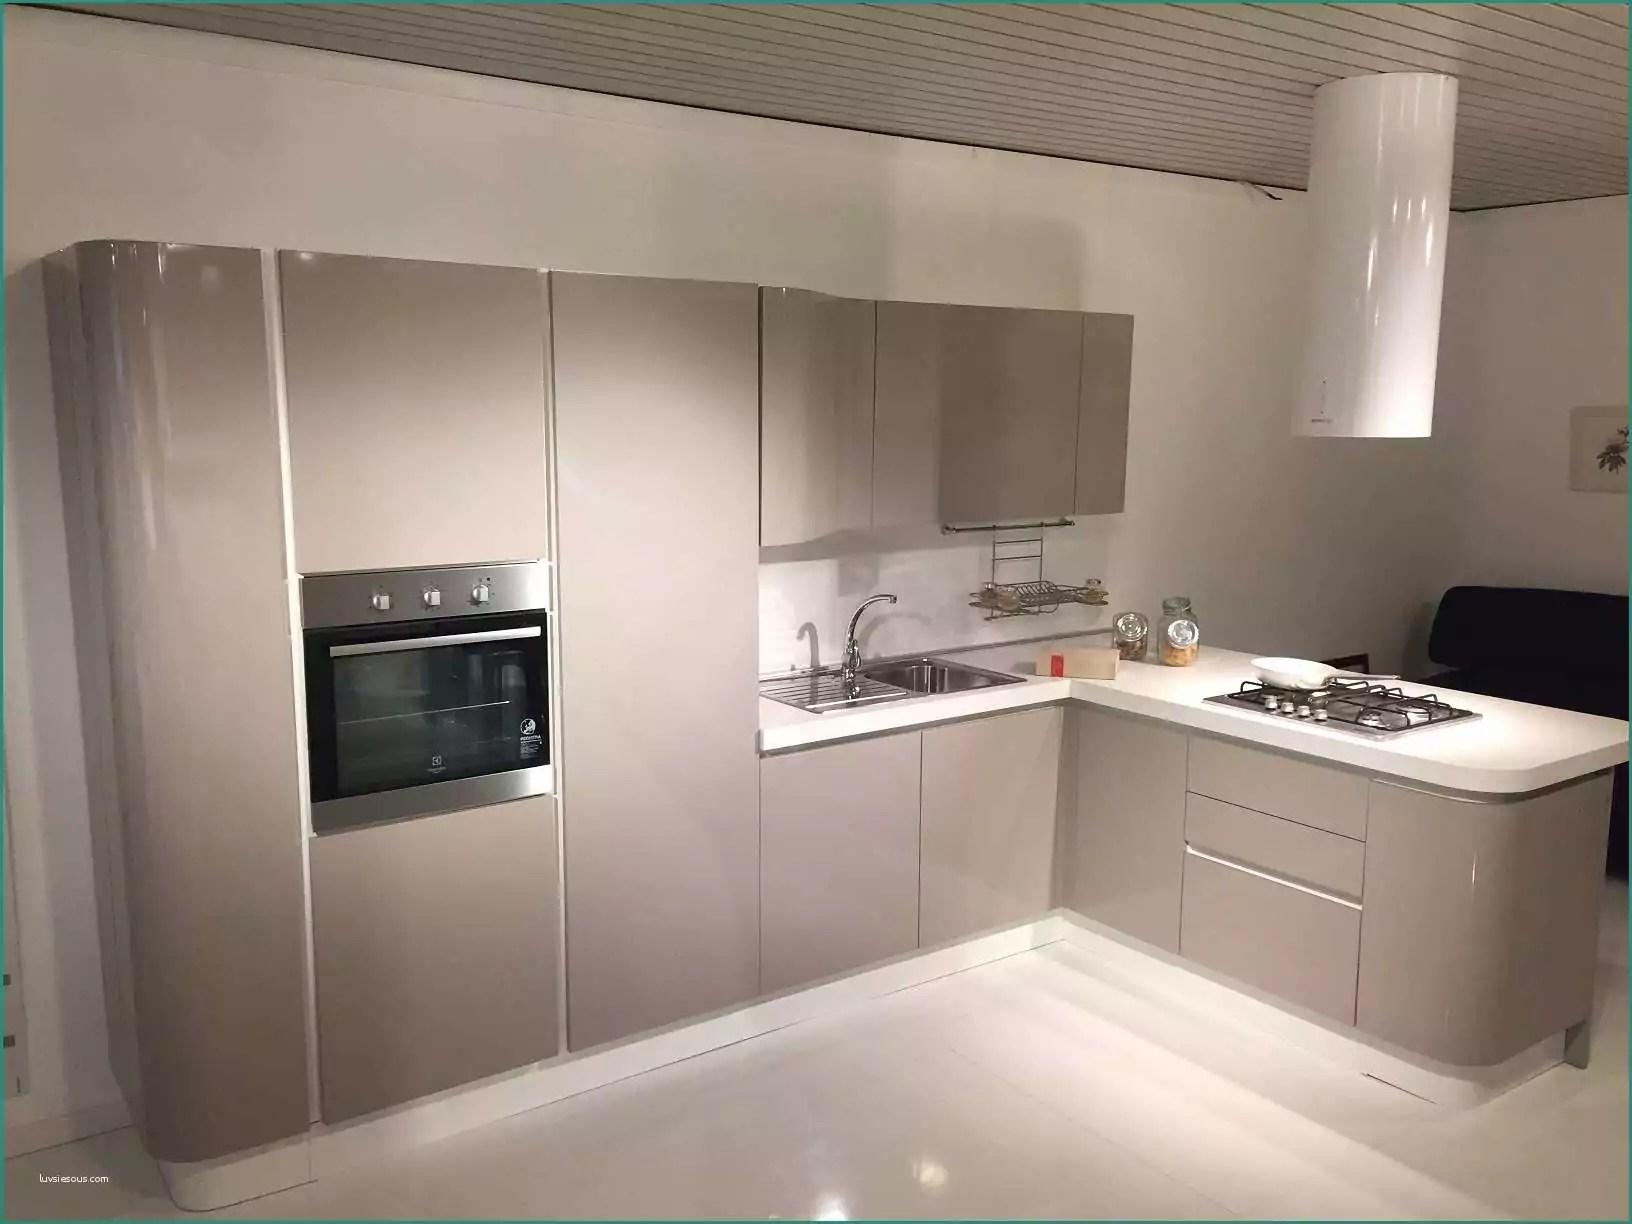 Cucine Varenna Opinioni E Cucine Line Outlet Home Design